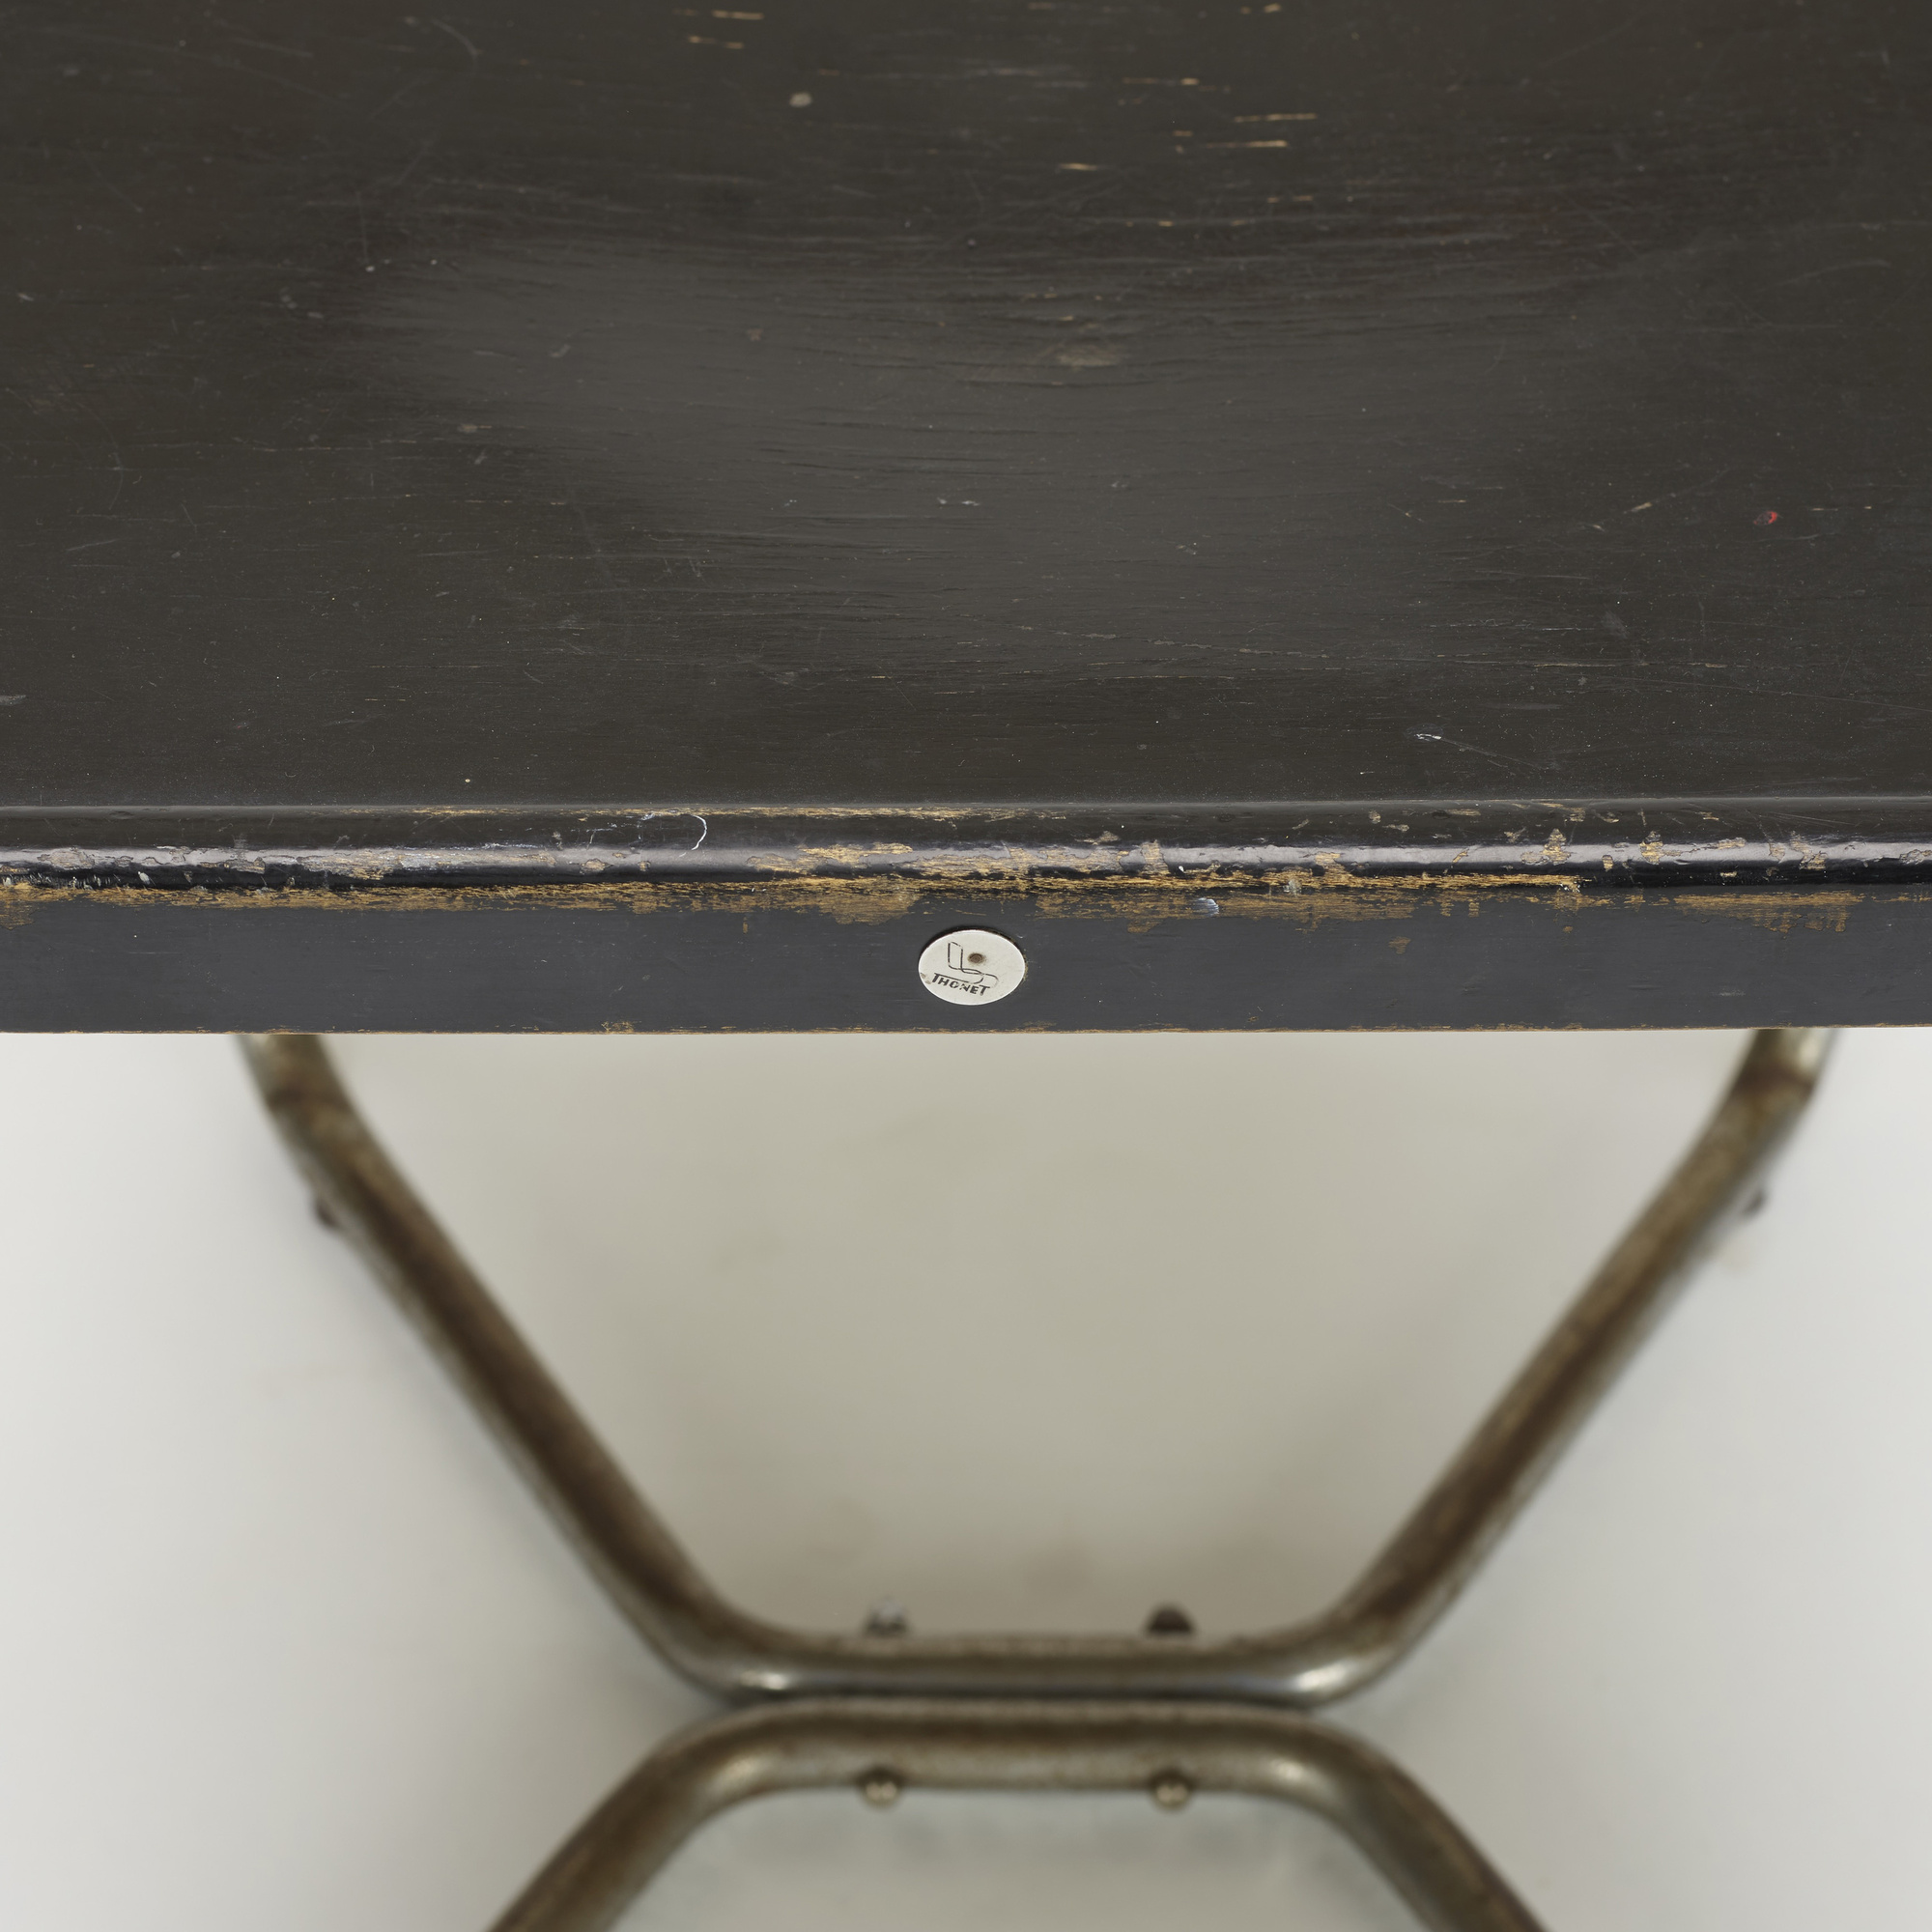 148: Marcel Breuer / stool, model B56 (2 of 2)